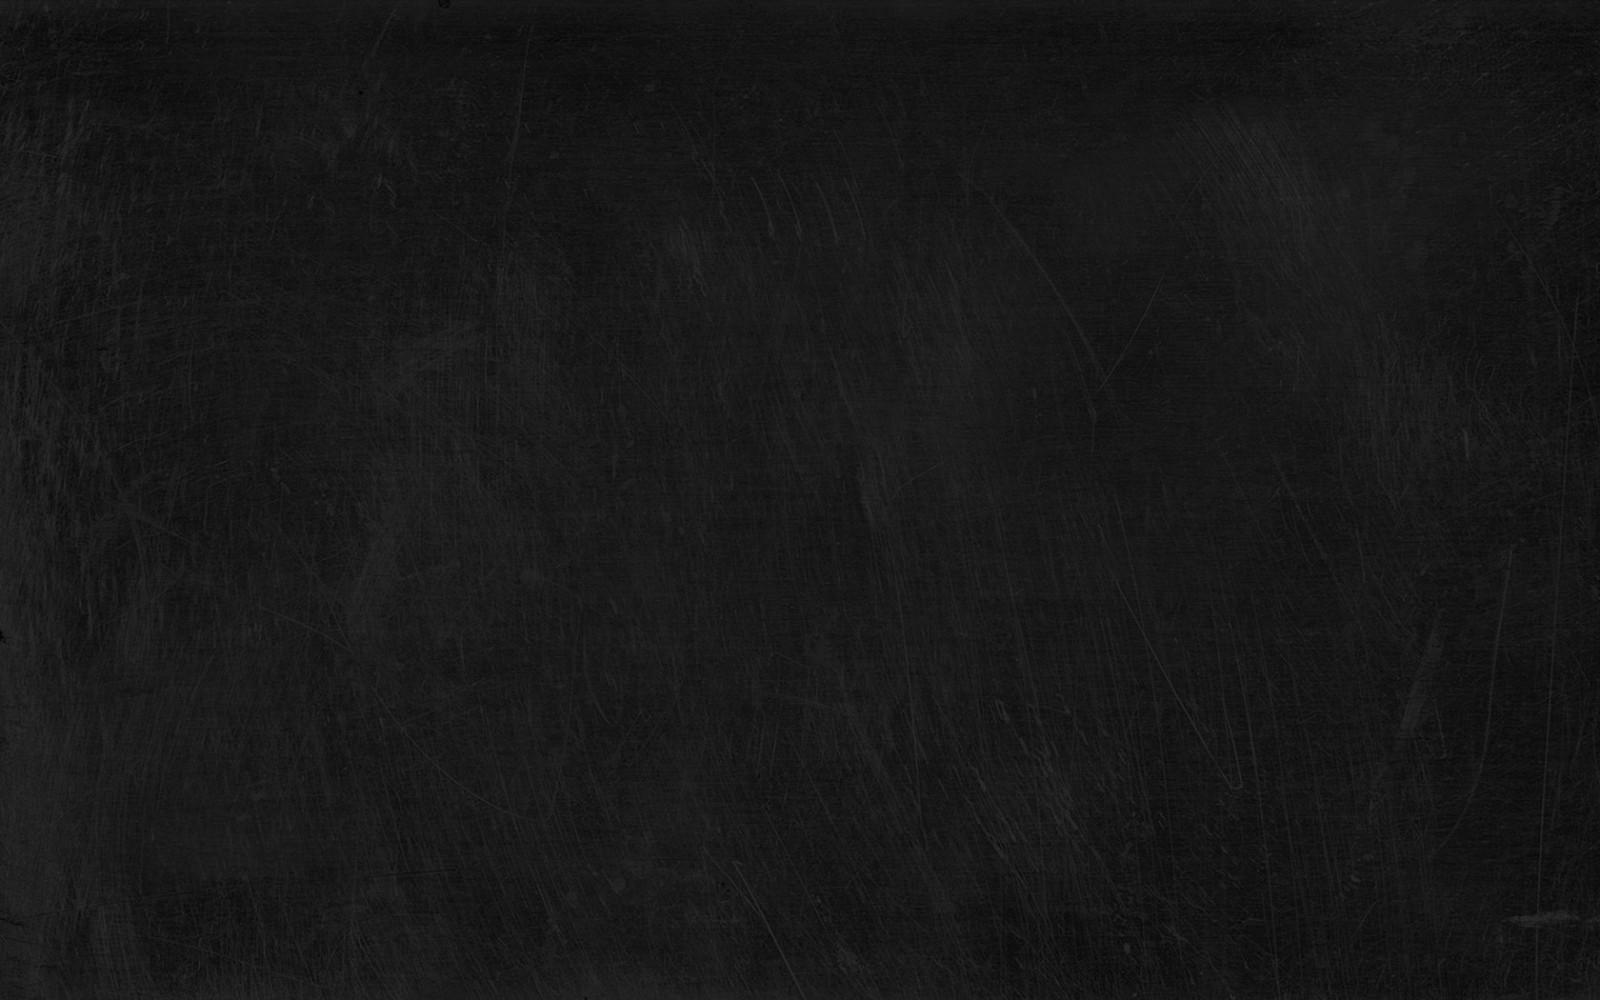 Fondos de pantalla monocromo minimalismo pizarra - Piso de pizarra ...